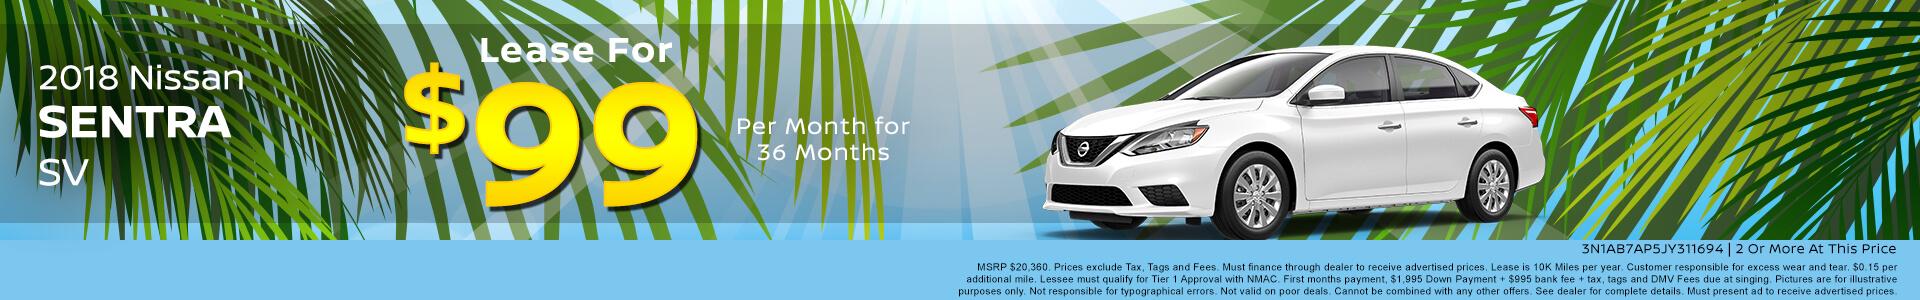 Nissan Sentra $99 Lease